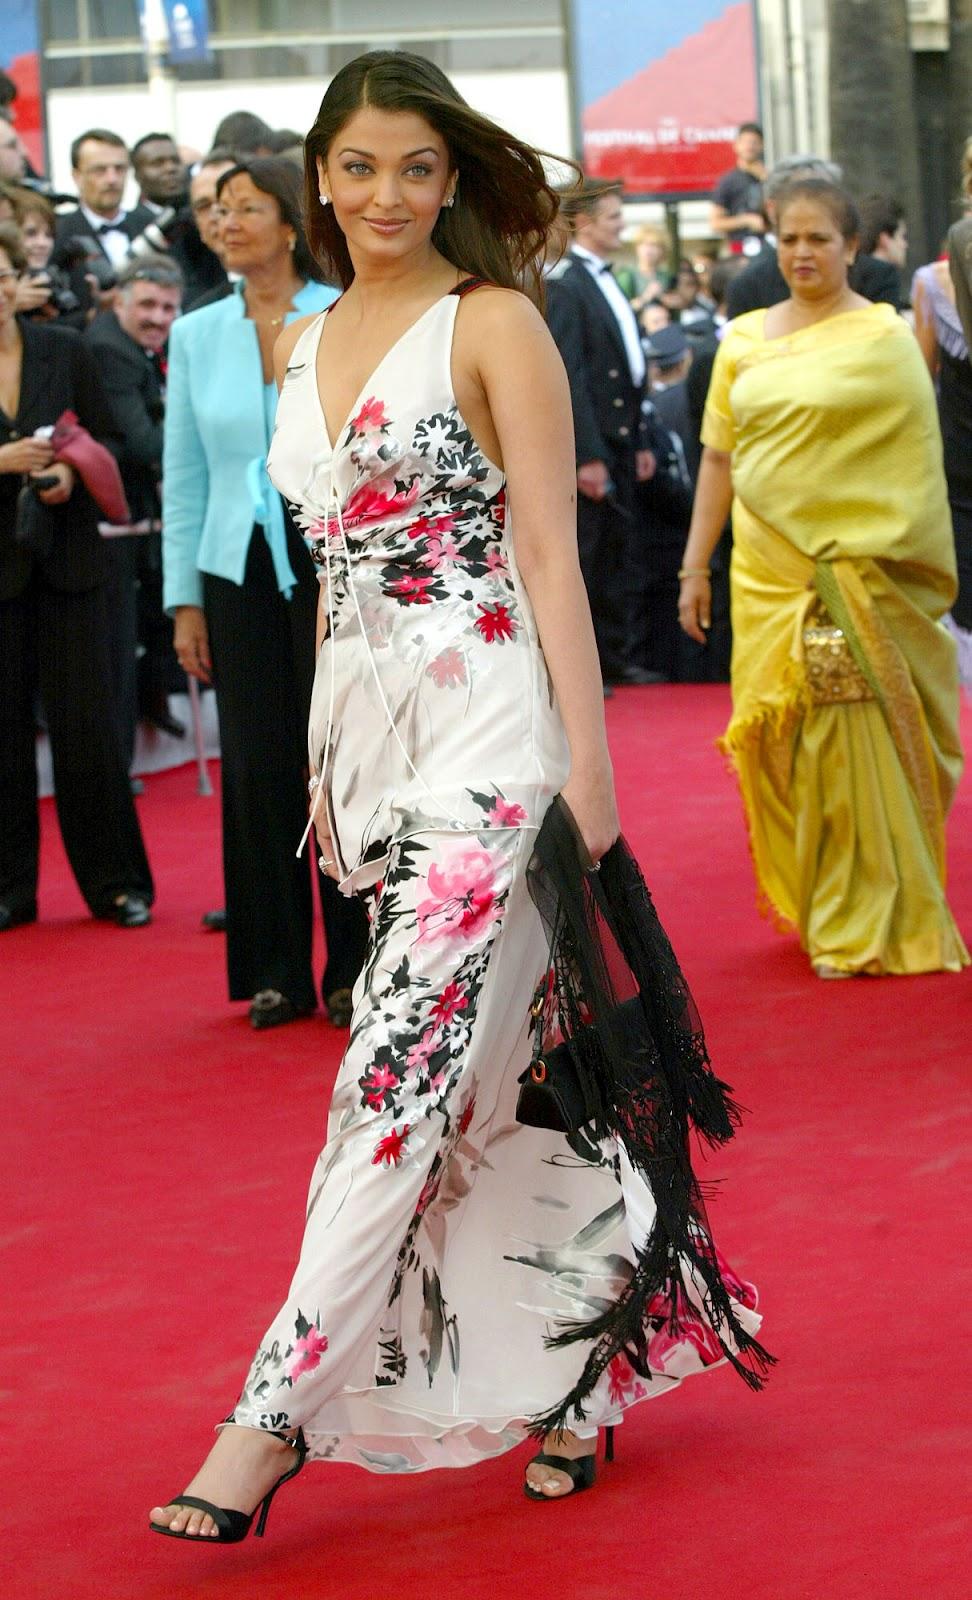 EXCLUSIVE: Aishwarya Rai Bachchan and Abhishek Bachchan to ...